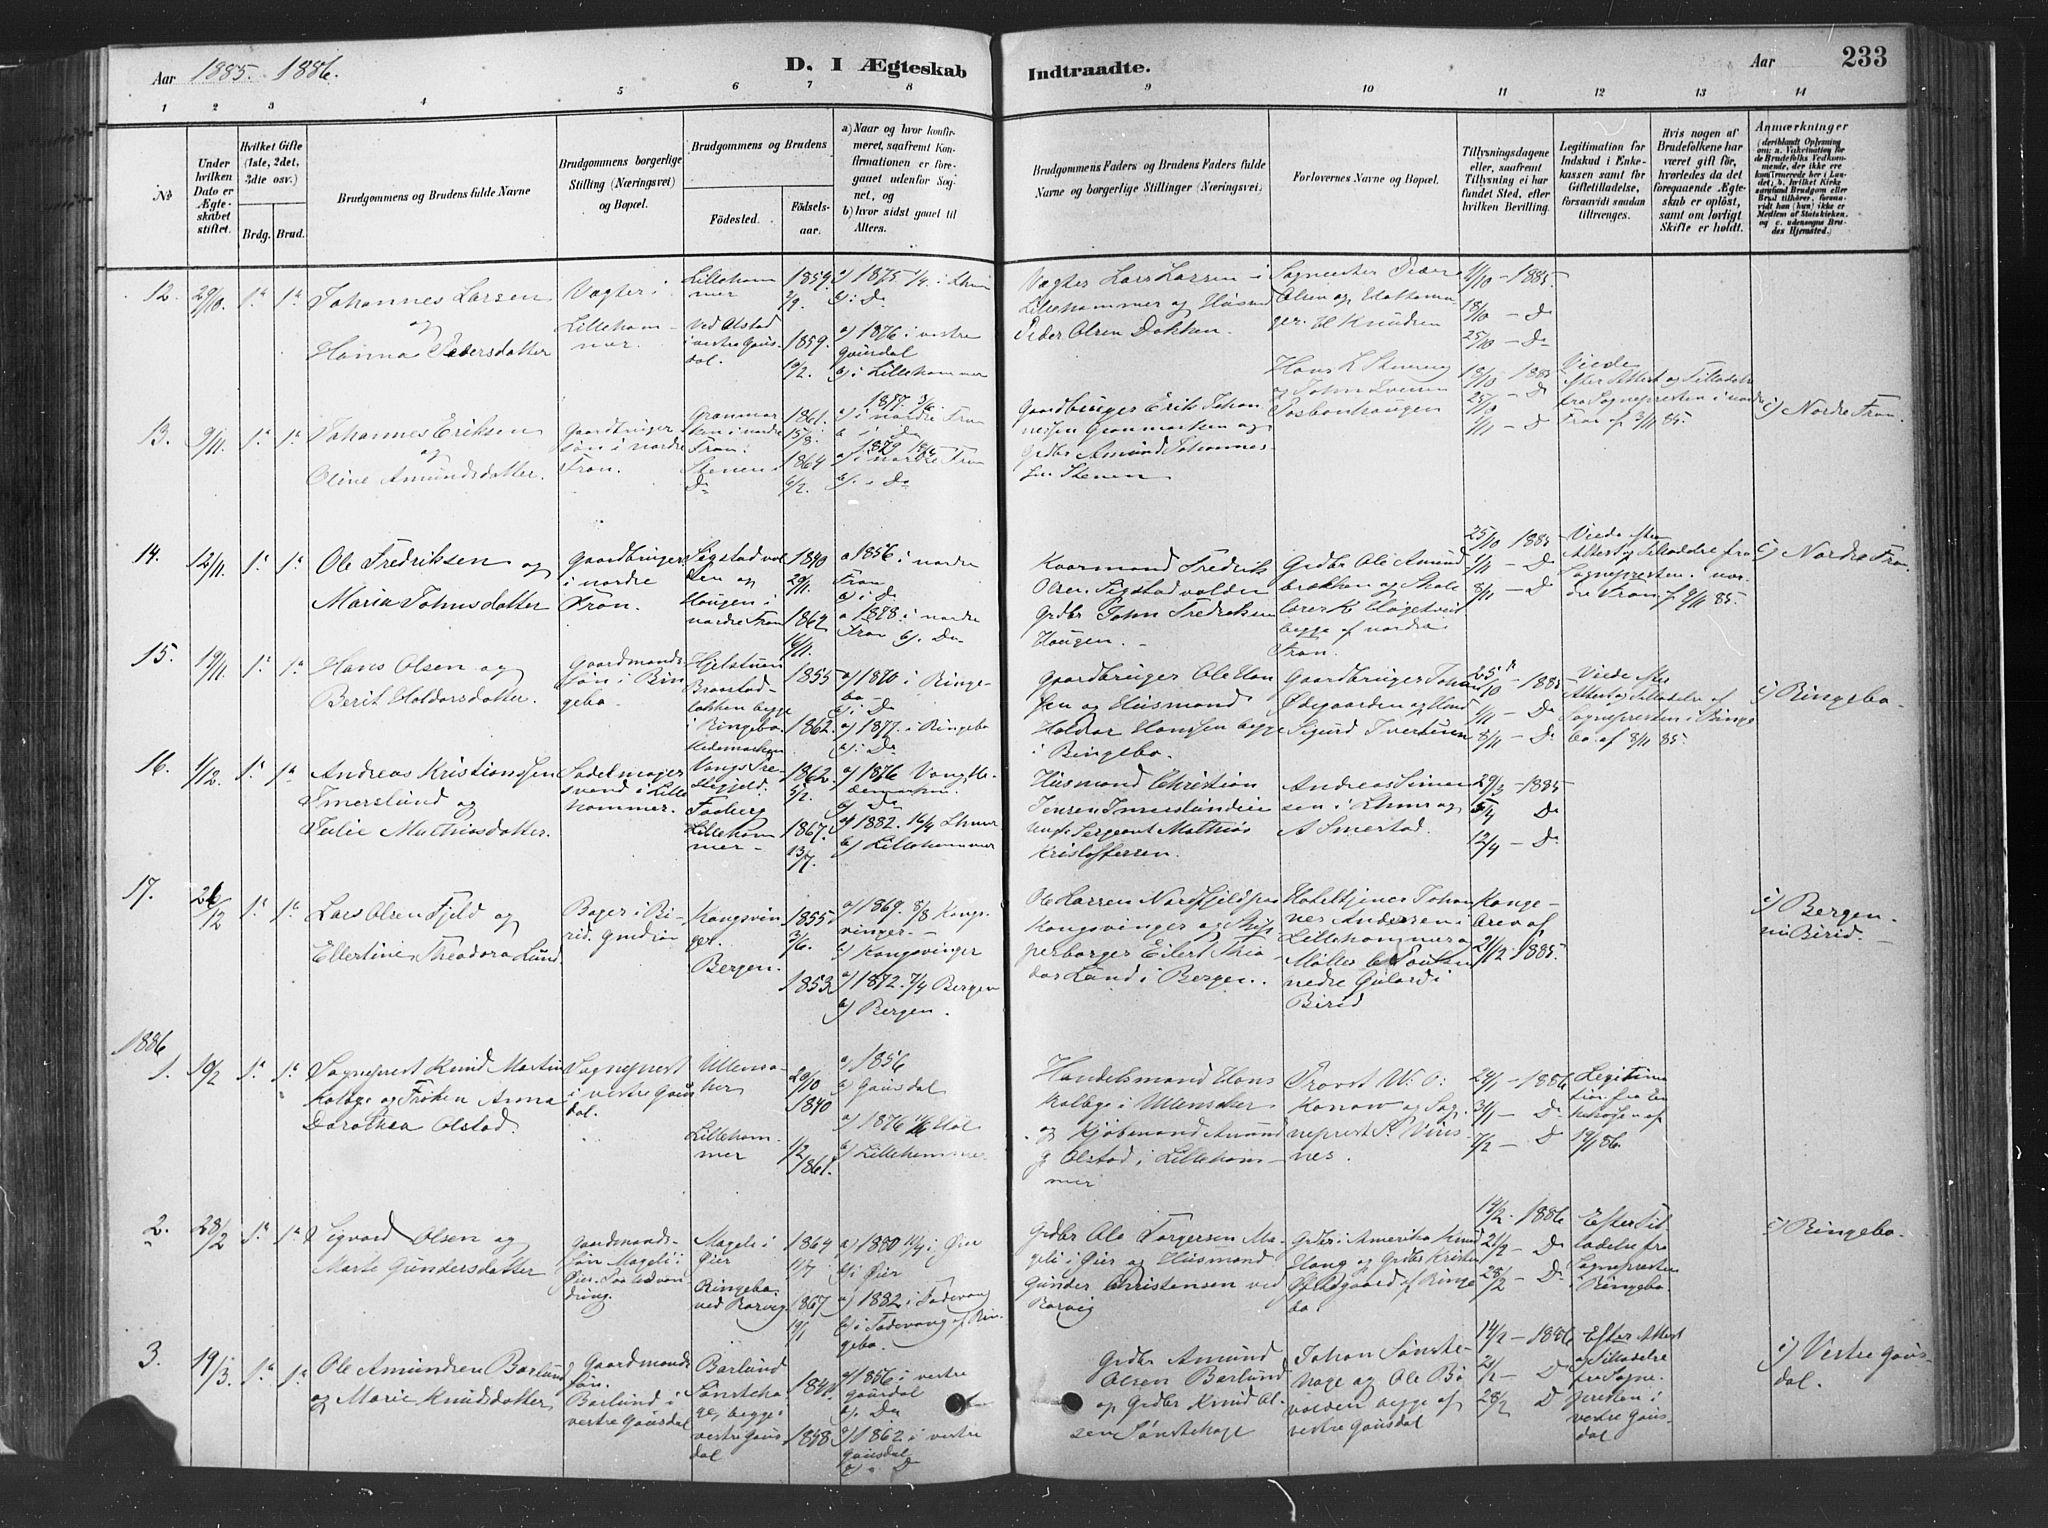 SAH, Fåberg prestekontor, H/Ha/Haa/L0010: Parish register (official) no. 10, 1879-1900, p. 233